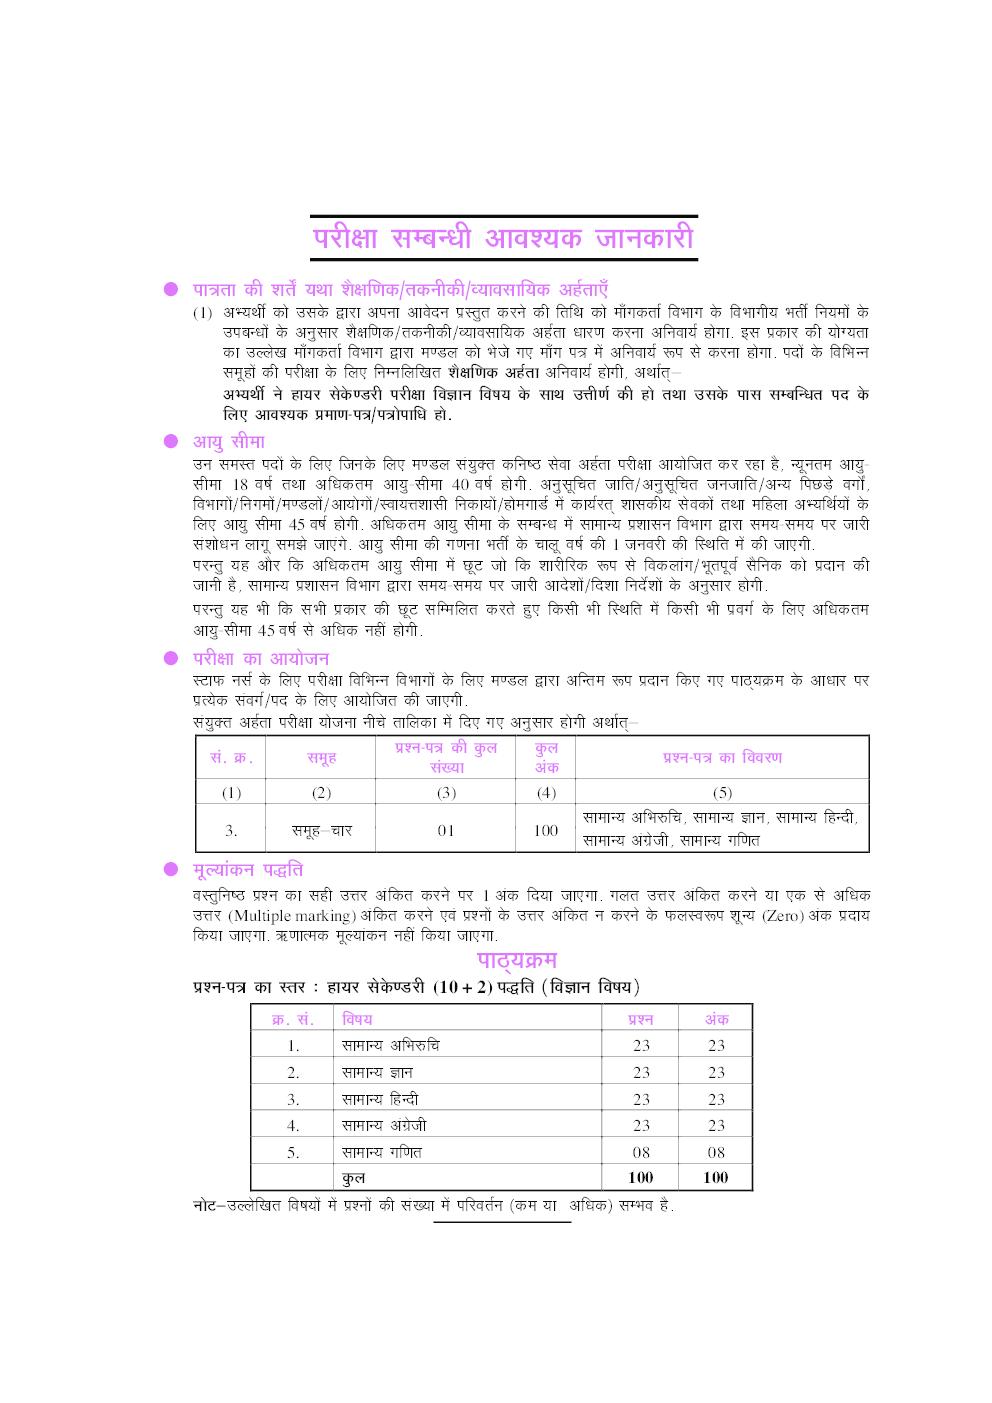 मध्य प्रदेश स्टाफ नर्स संयुक्त चयन परीक्षा - Page 5